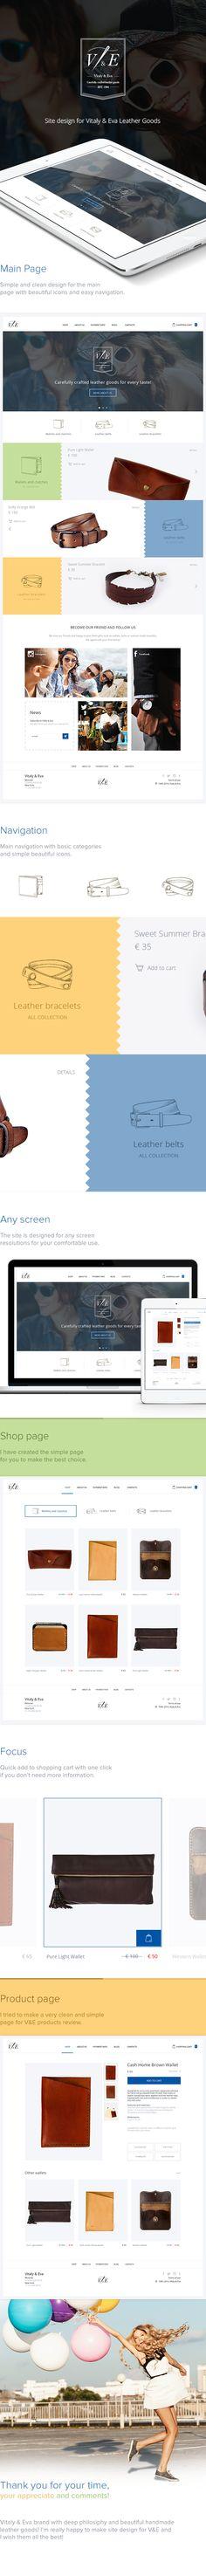 V&E Site Design on Web Design Served